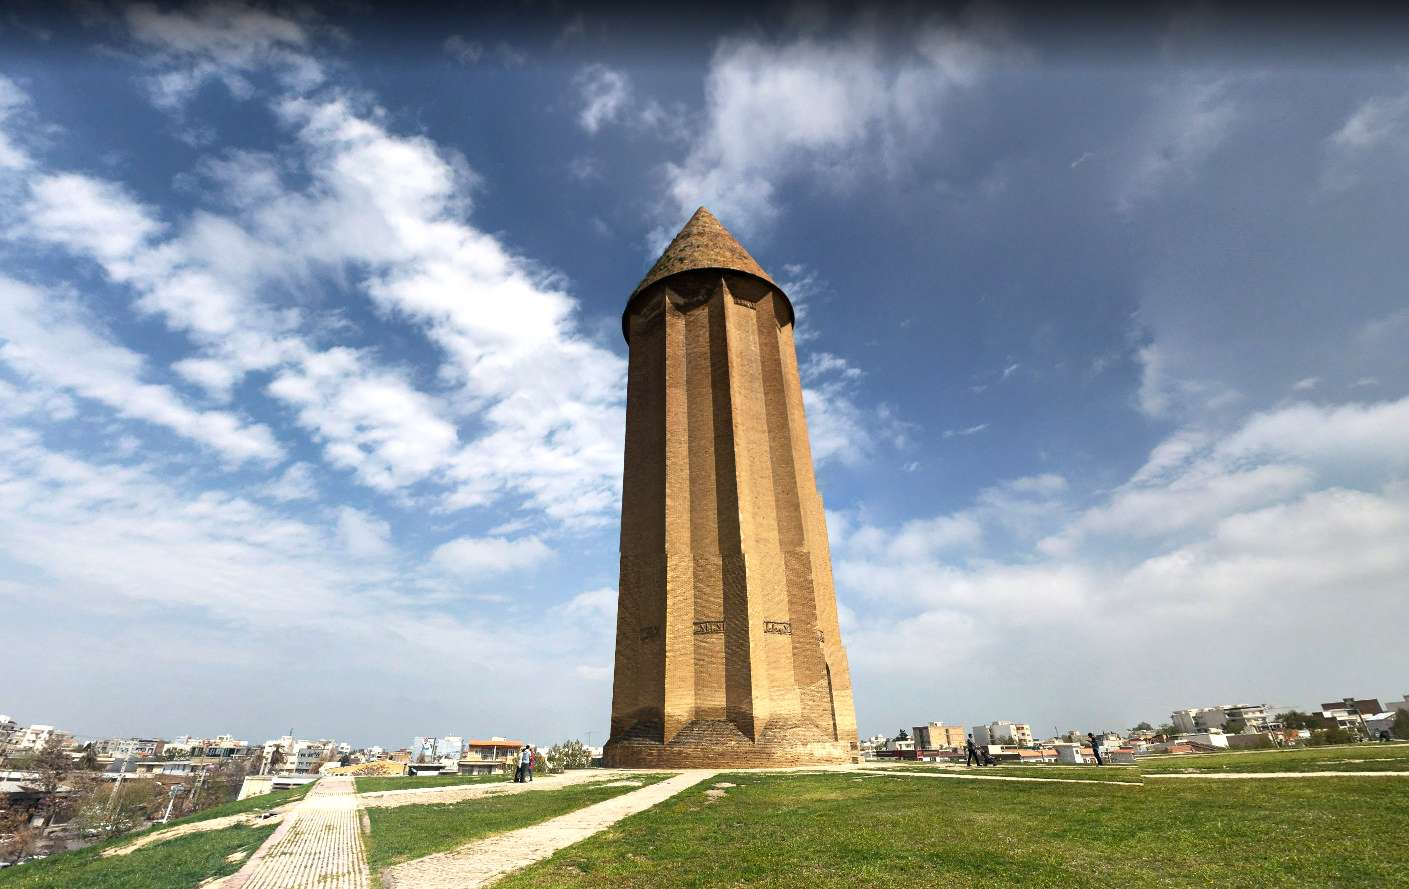 Gonbad-e Qabus Tower